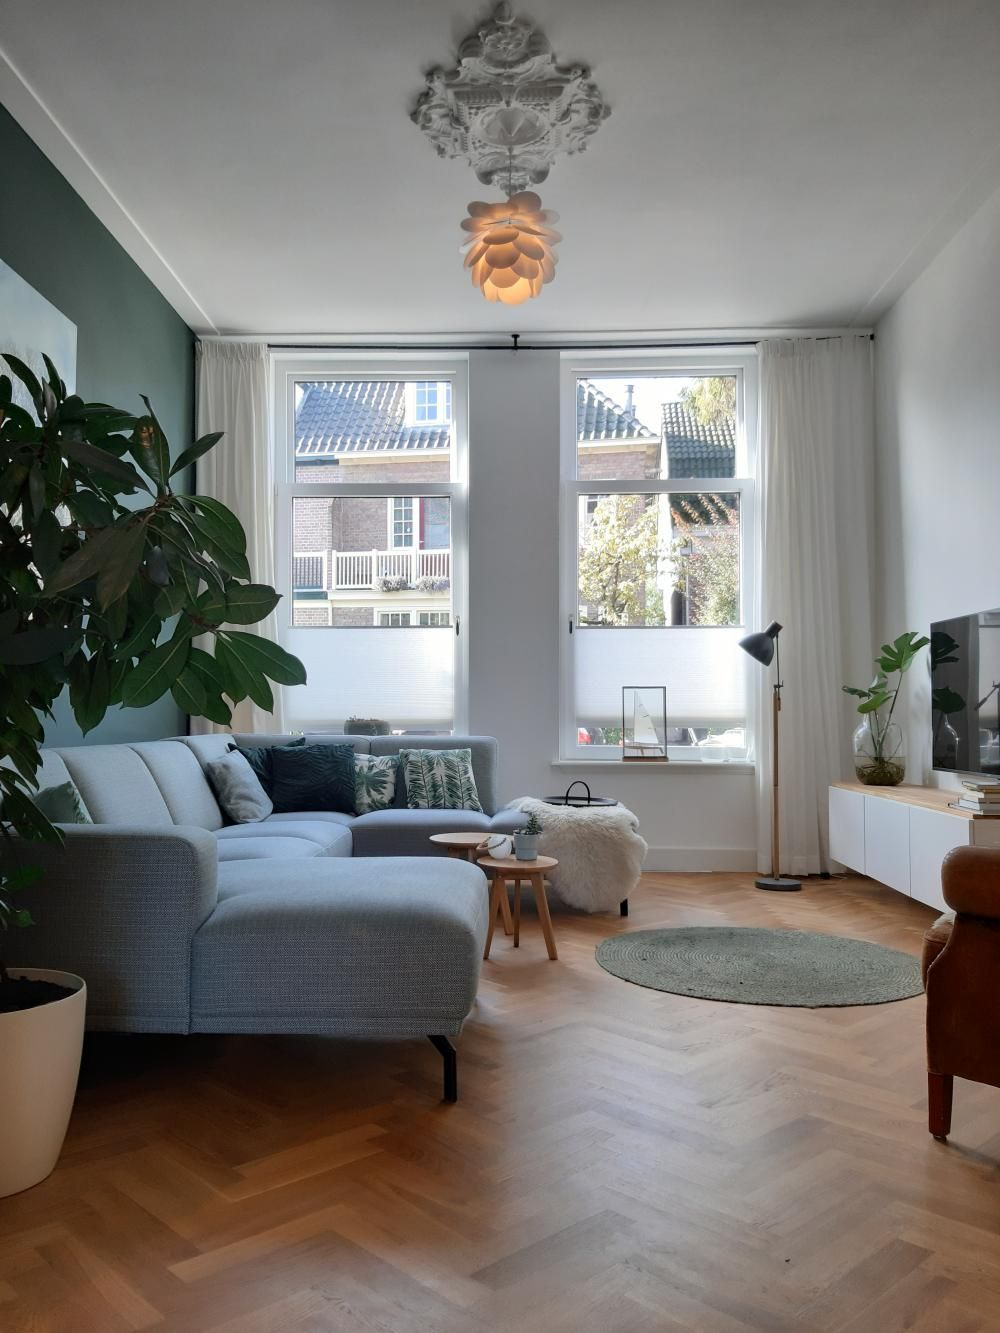 Woon Je In Een Oud Huis Mix Vintage Met Modern Voor Een Mooi Interieur Do You Live In An Old Huis Interieur Interieur Woonkamer Klein Appartement Woonkamer